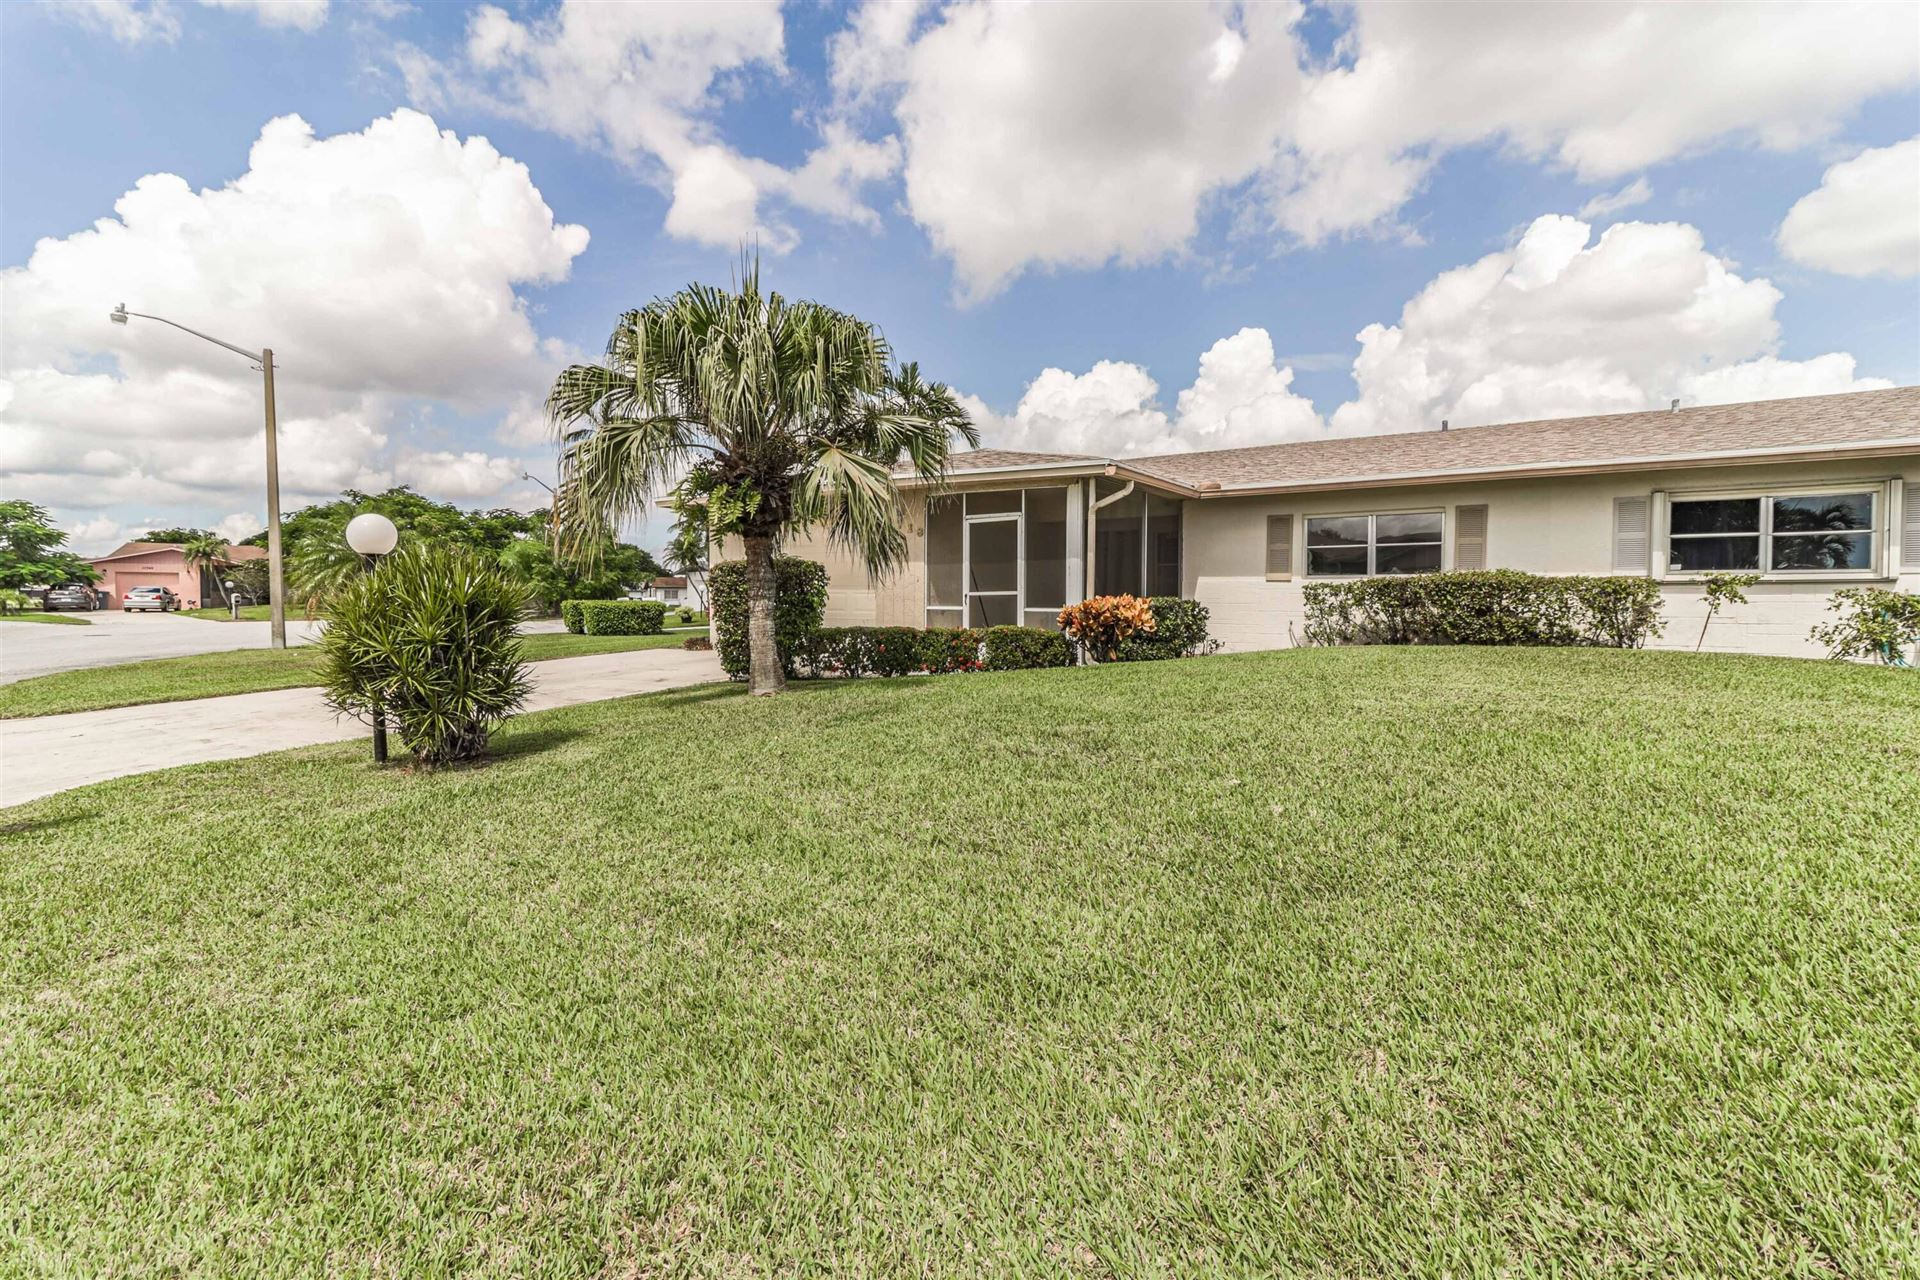 13718 E Whippet Way E, Delray Beach, FL 33484 - MLS#: RX-10746457